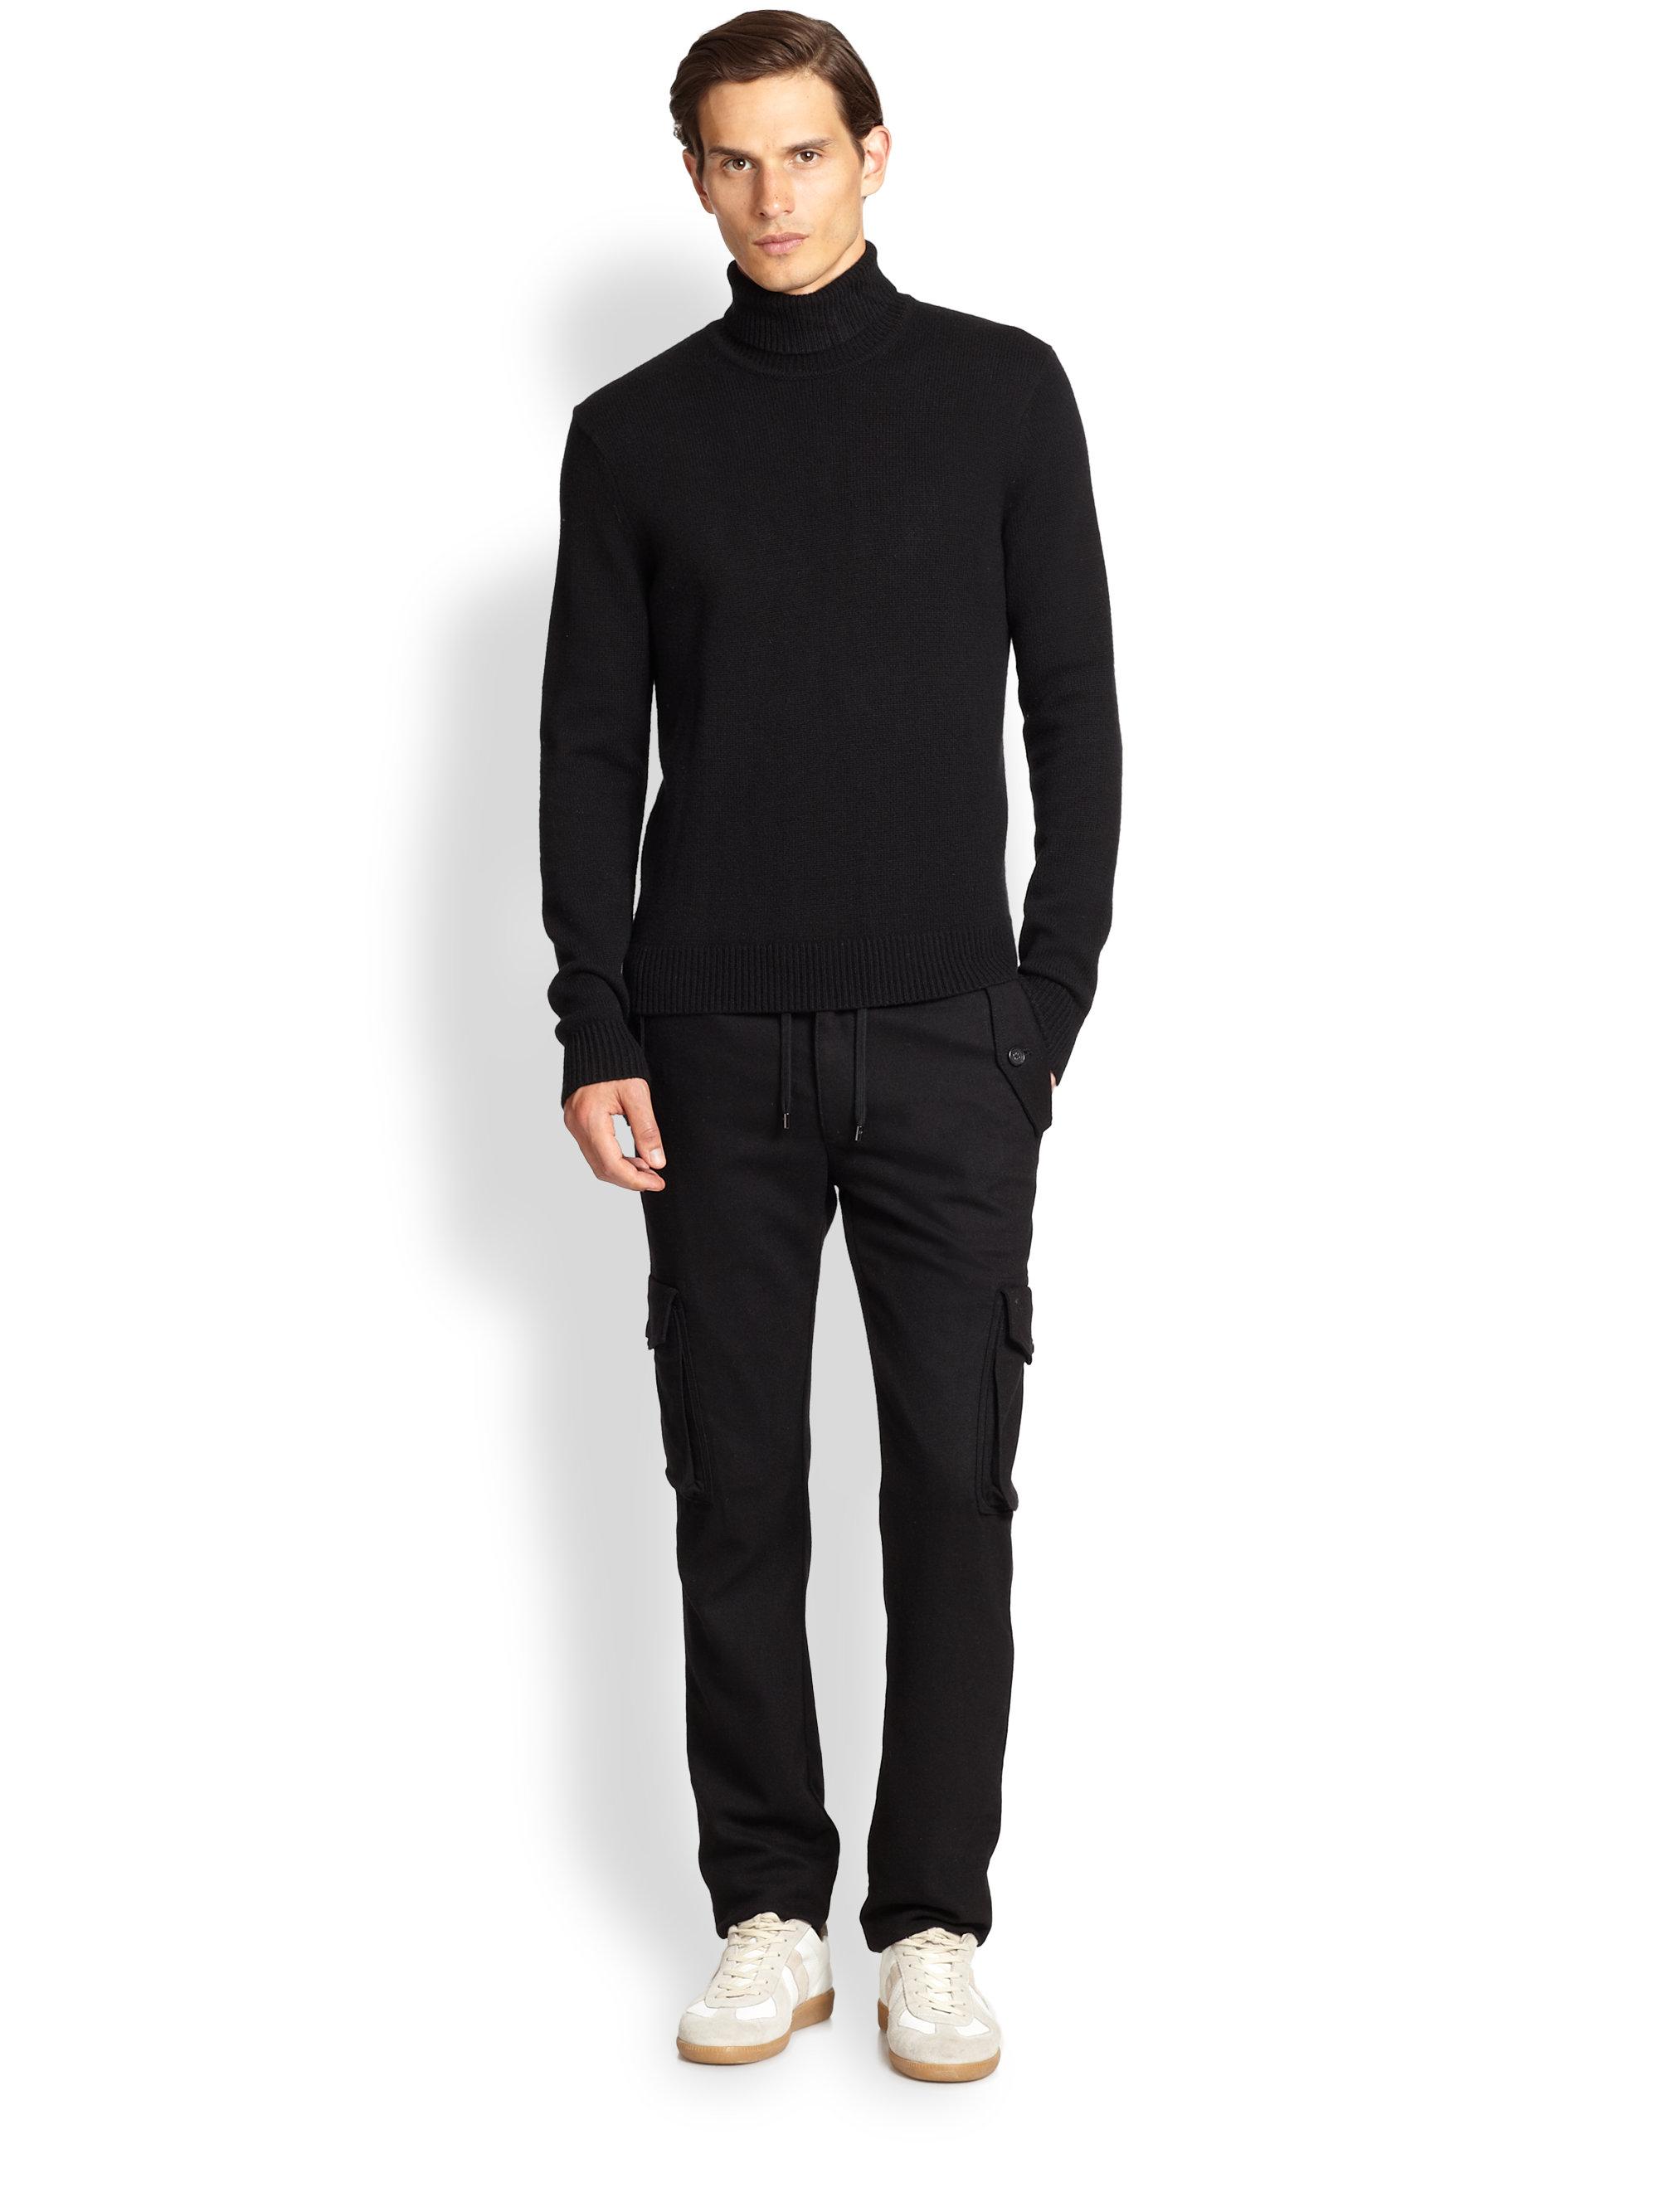 Lyst Michael Kors Cashmere Turtleneck Sweater In Black For Men